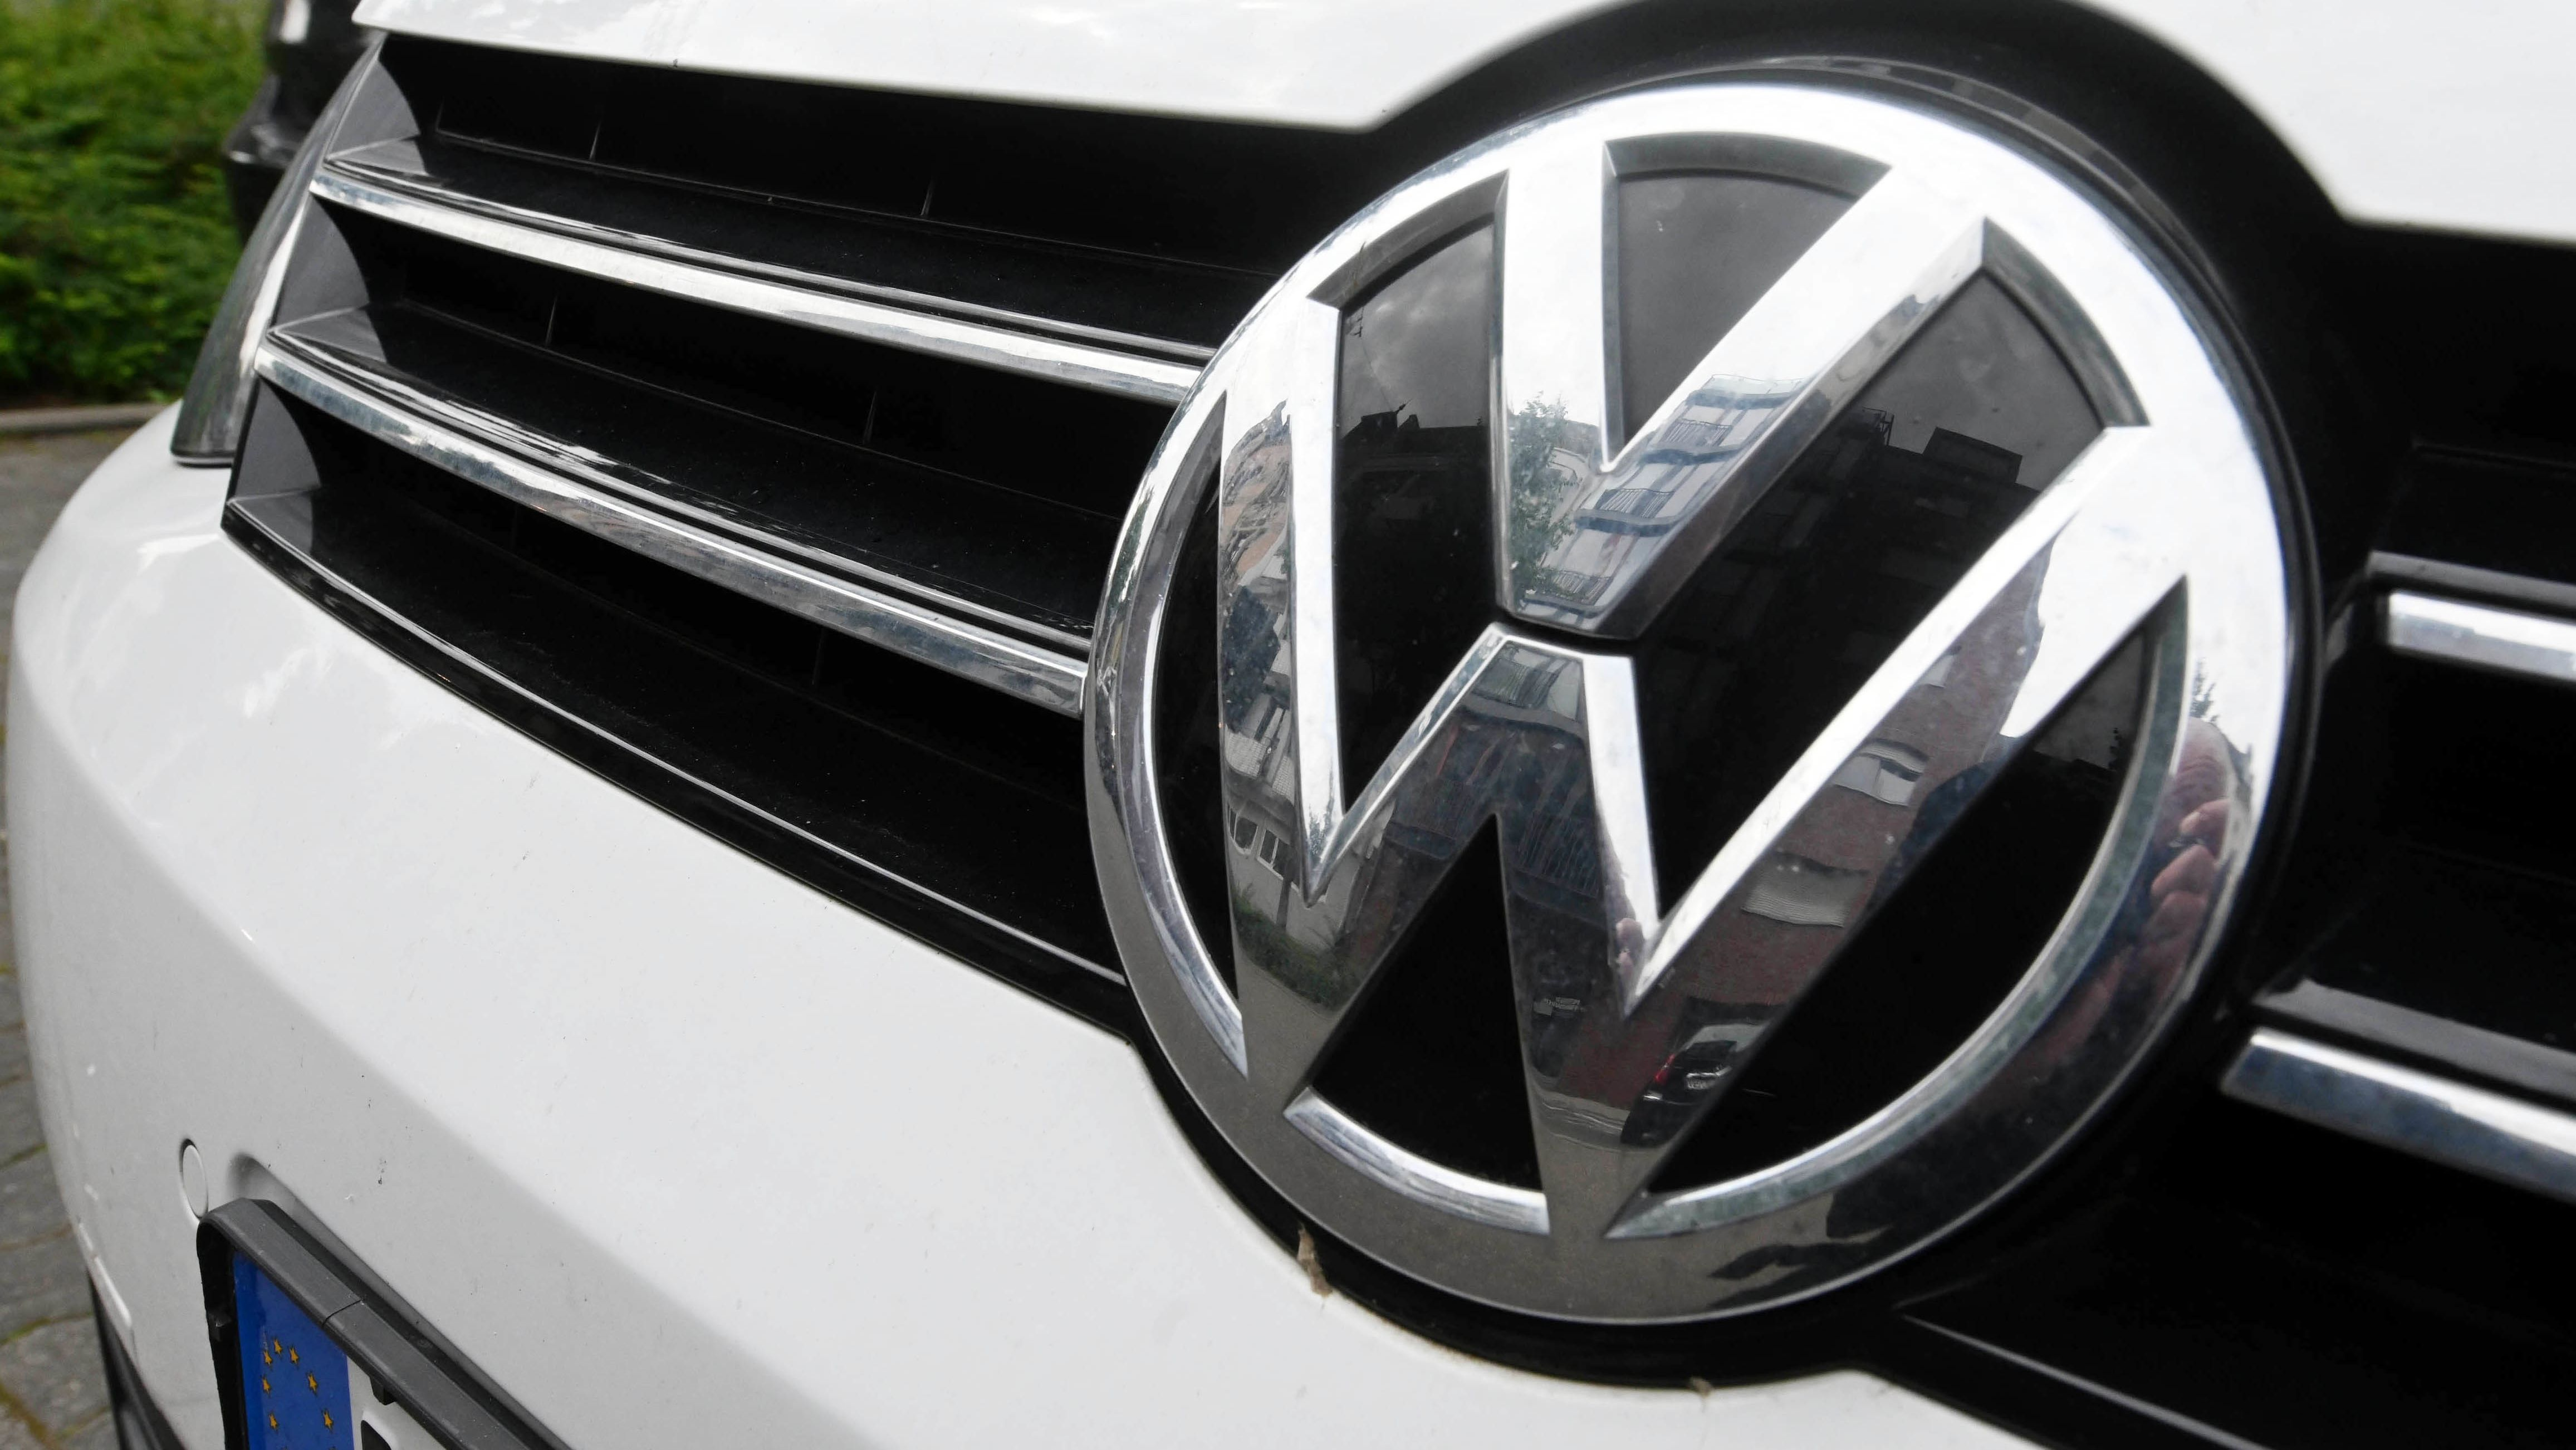 VW-Emblem auf Kühlergrill